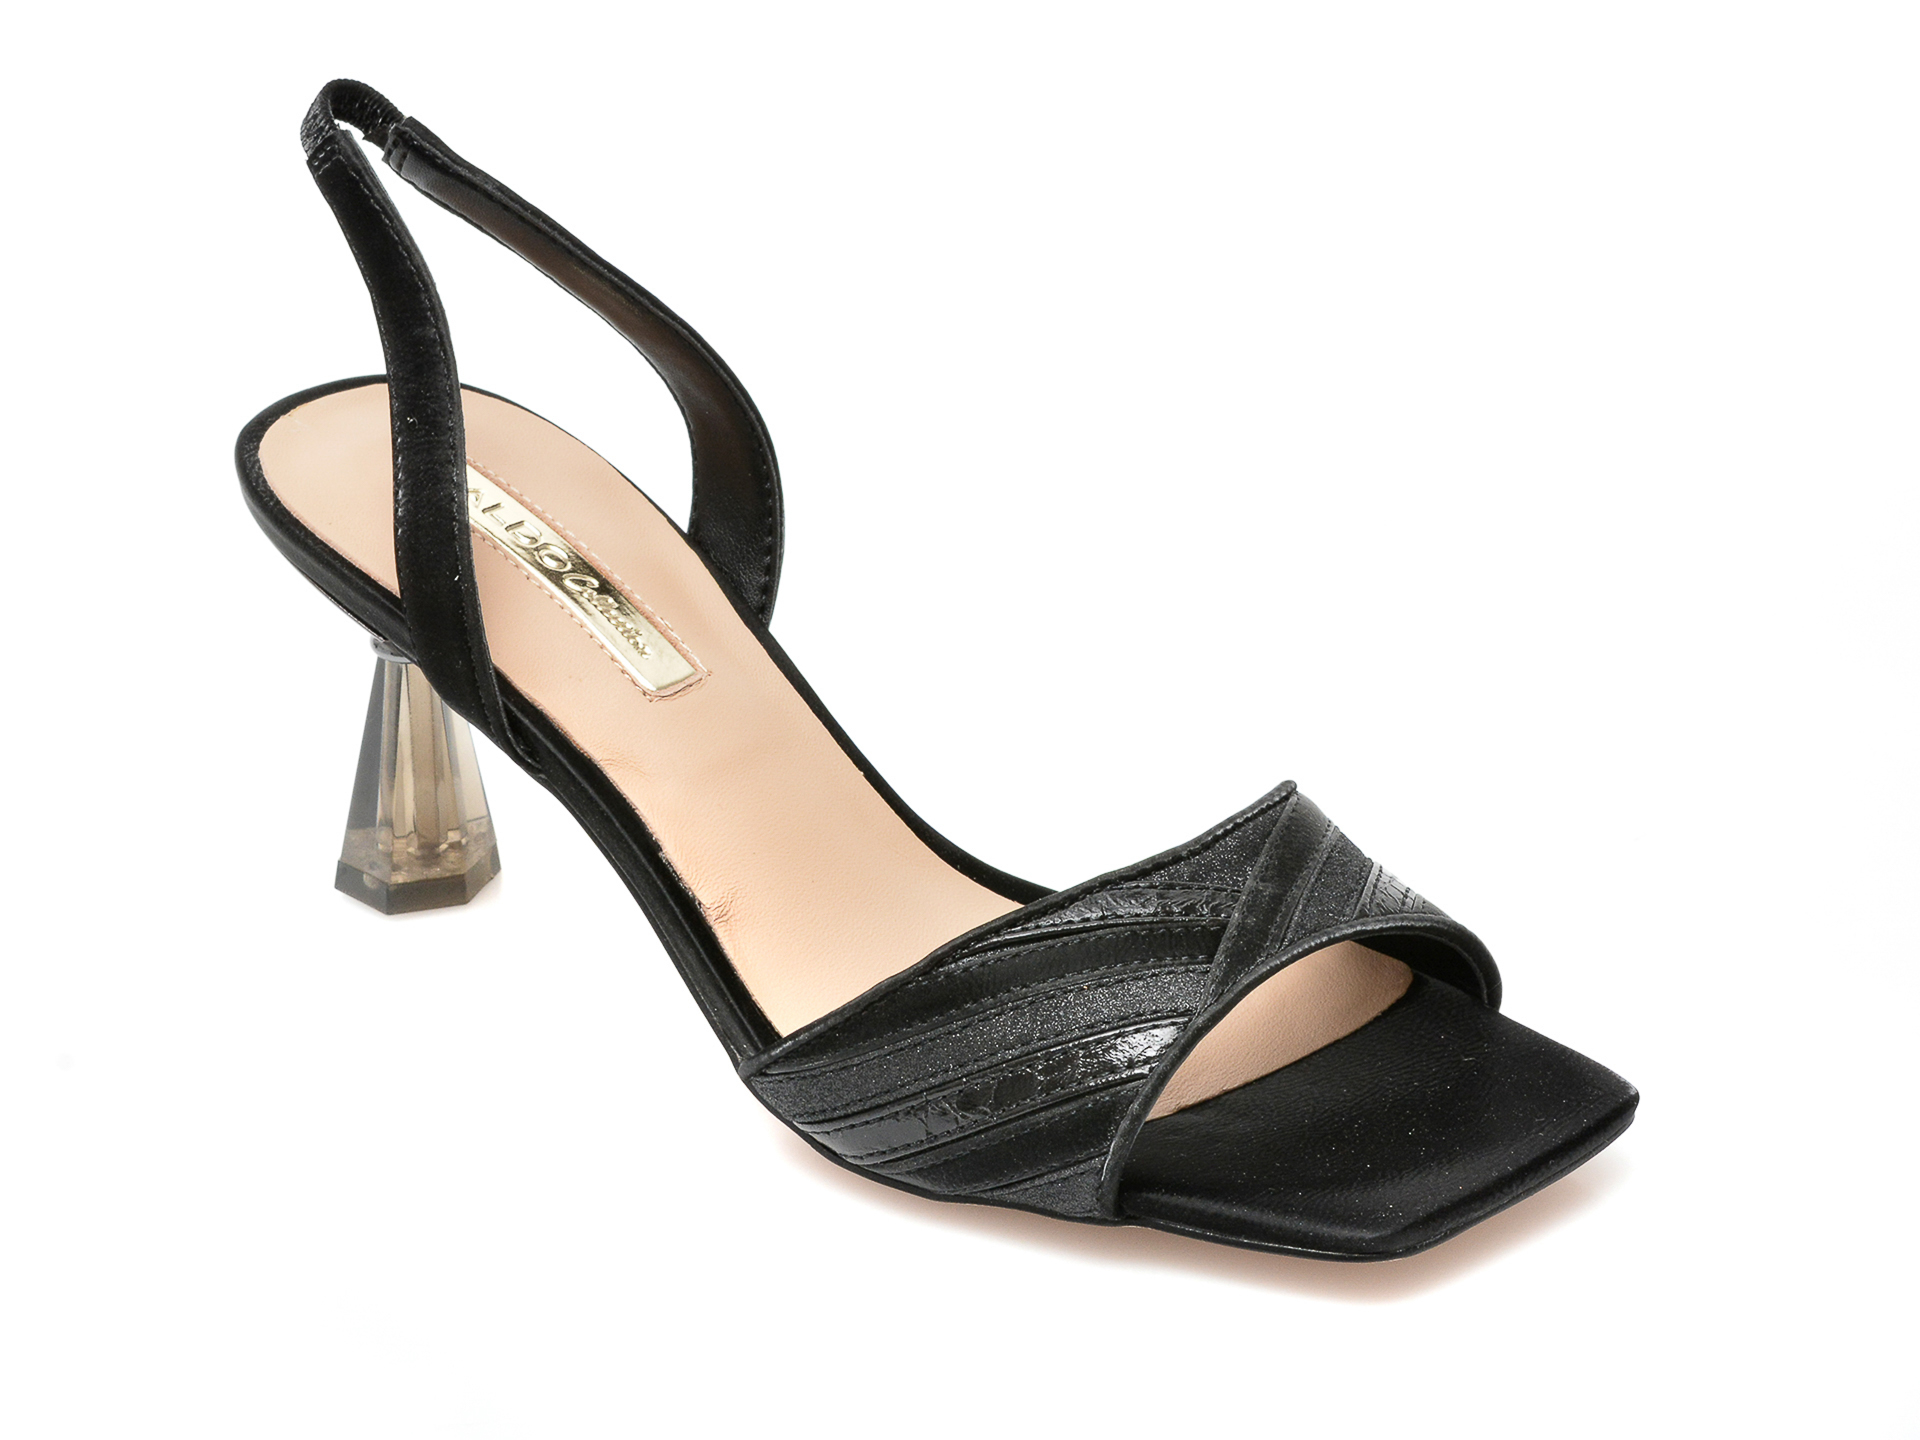 Sandale ALDO negre, Alinia001, din piele ecologica imagine otter.ro 2021